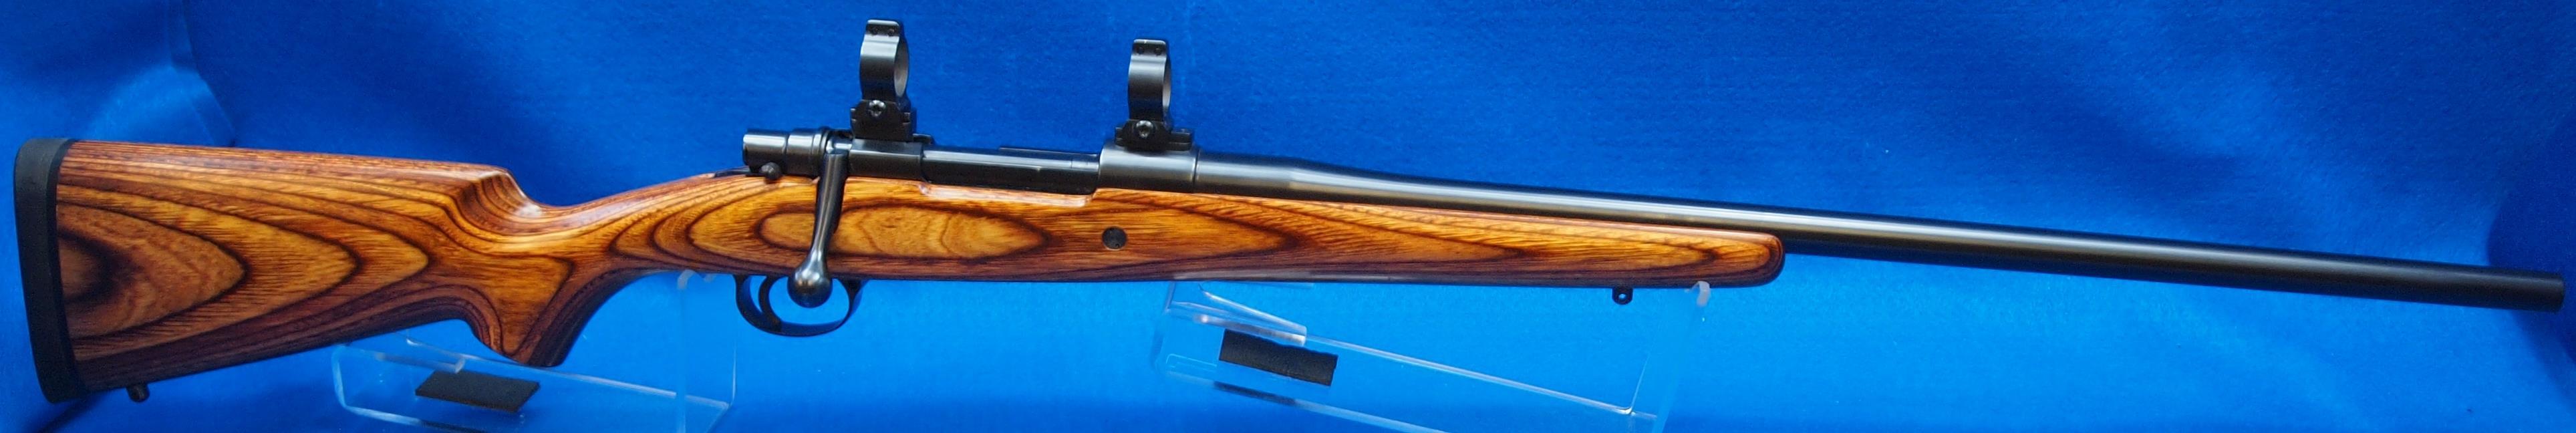 416 Taylor Mauser VZ24 rifle